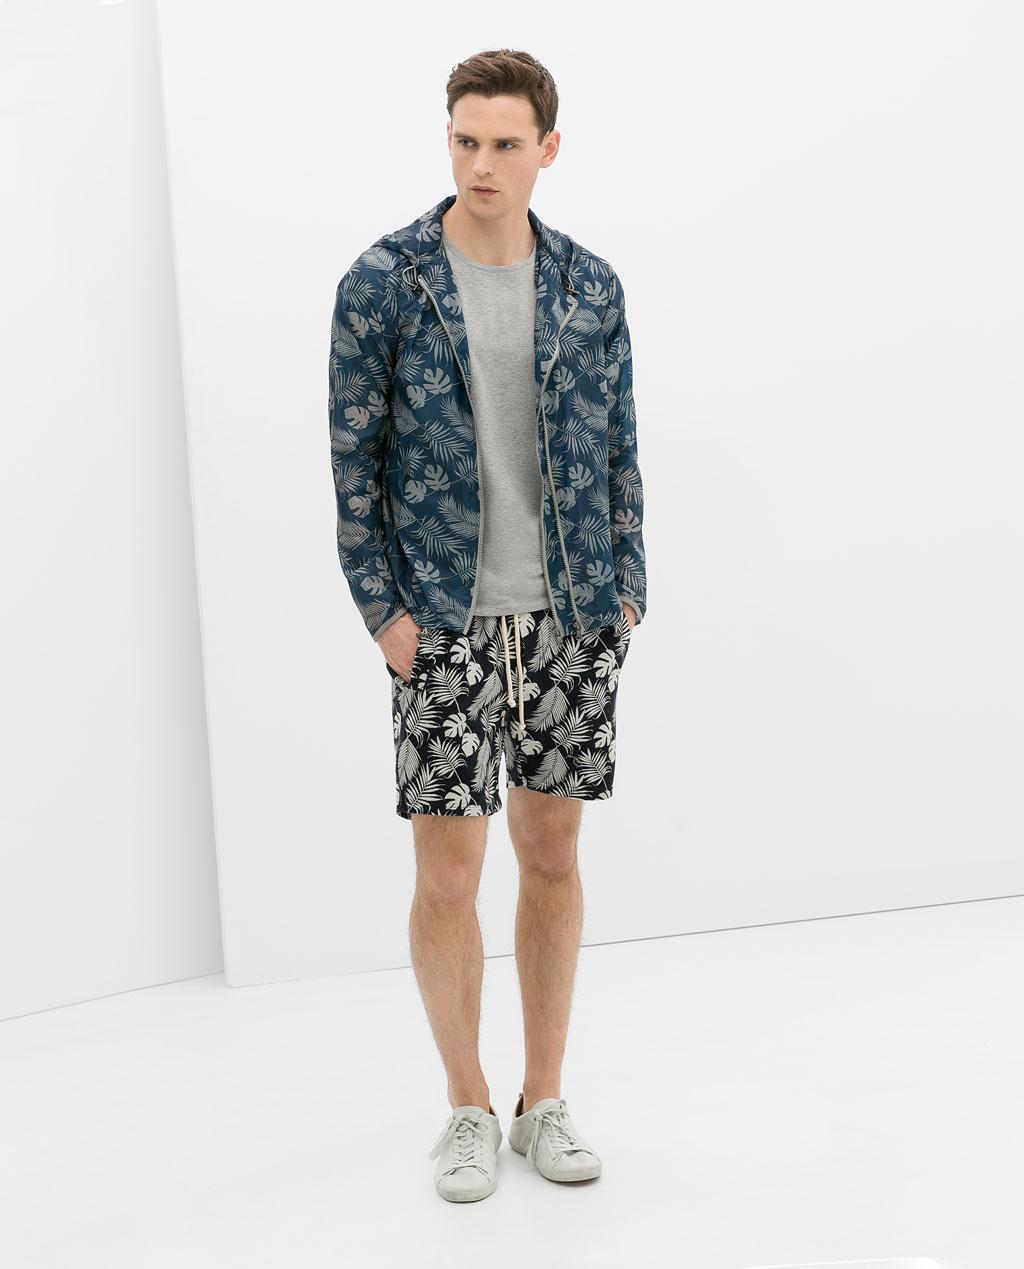 020abdbb 10 Summer Jackets For Men From Zara | The Fashion Supernova